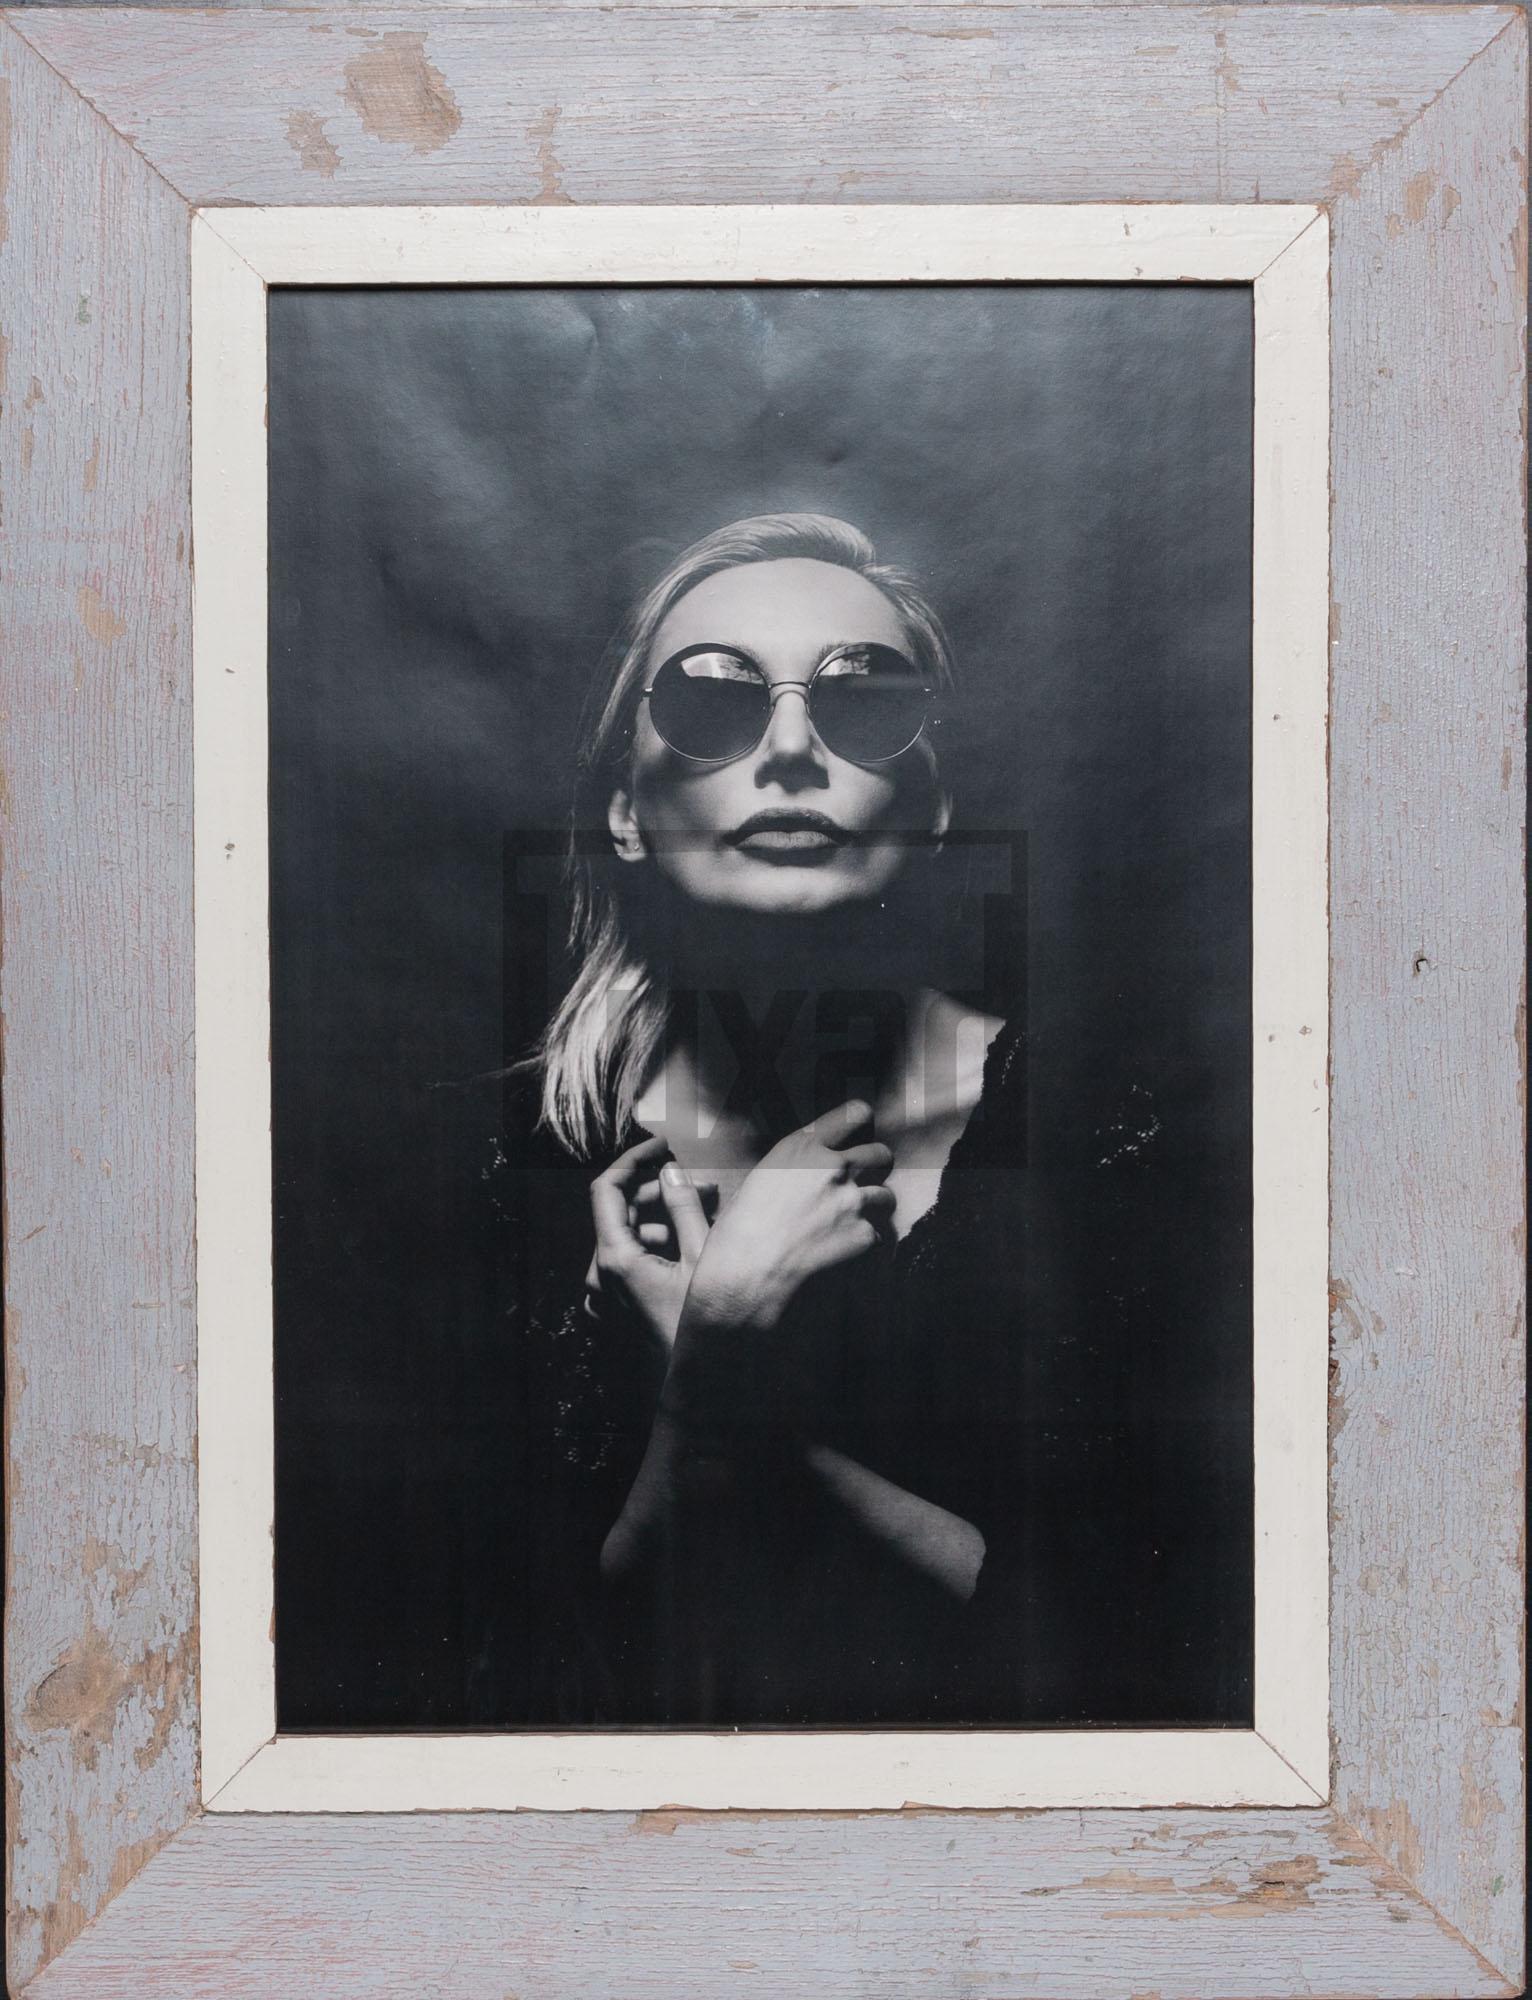 Vintage-Fotorahmen aus recyceltem Holz für ca. 29,7 x 42 cm große Fotos